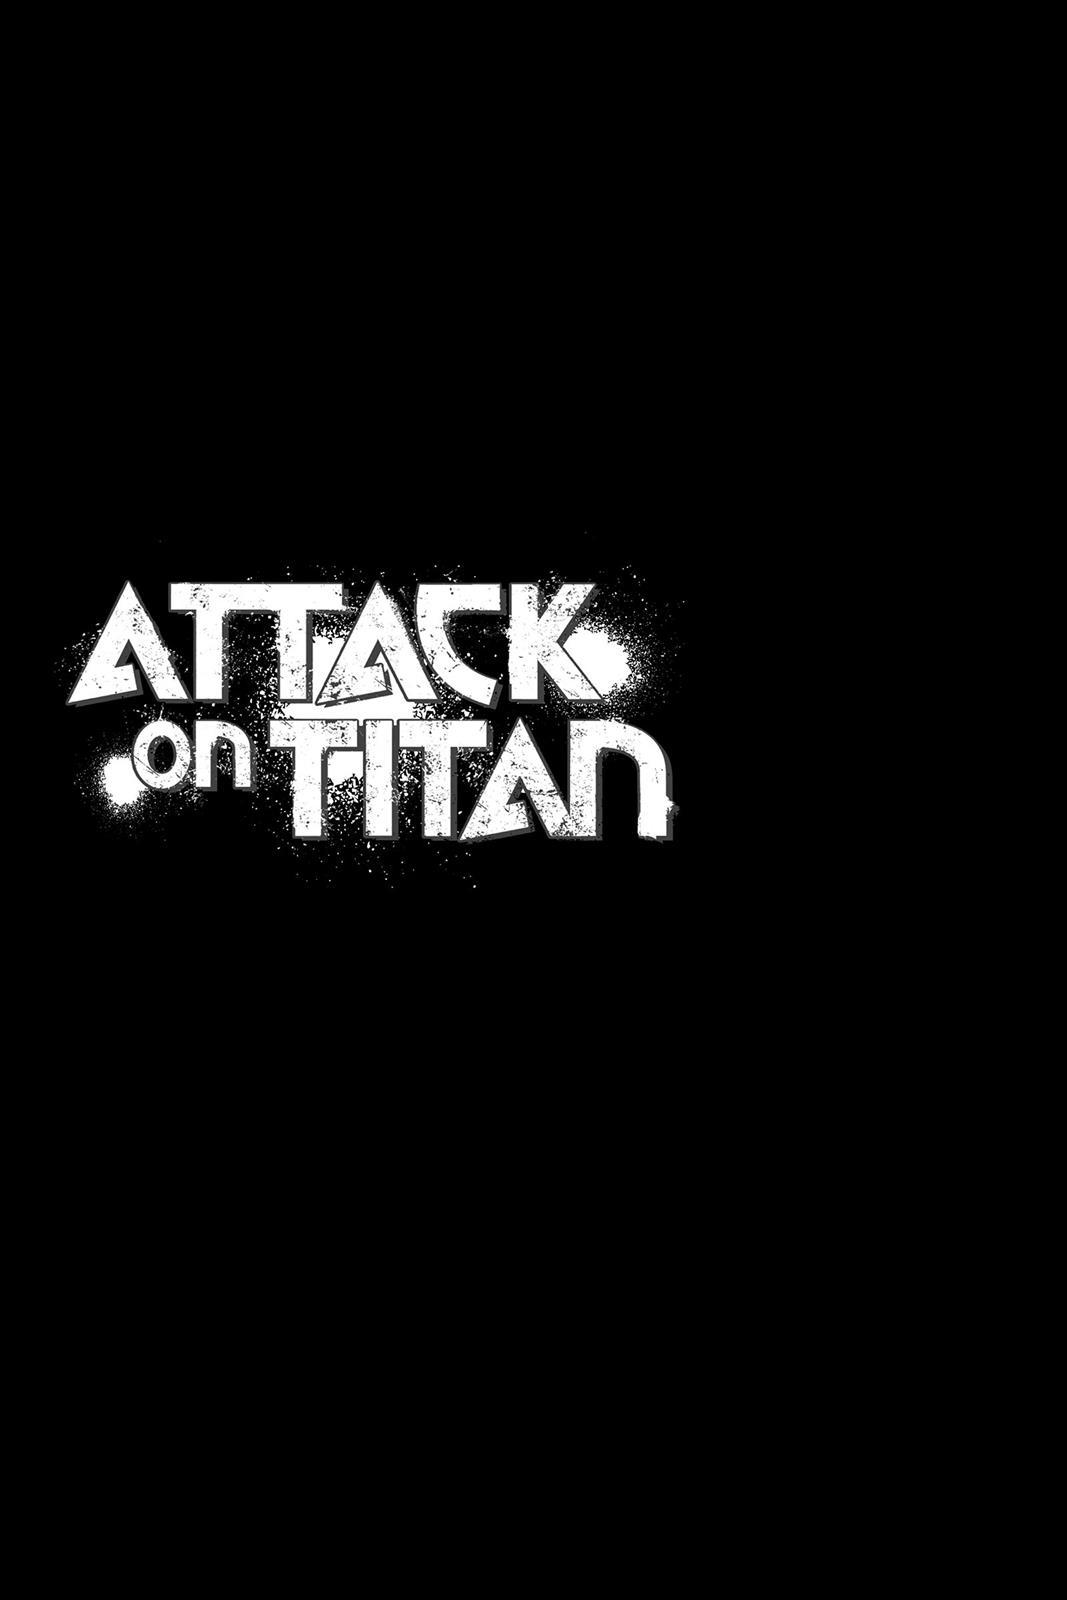 Attack On Titan, Episode 79 image 046